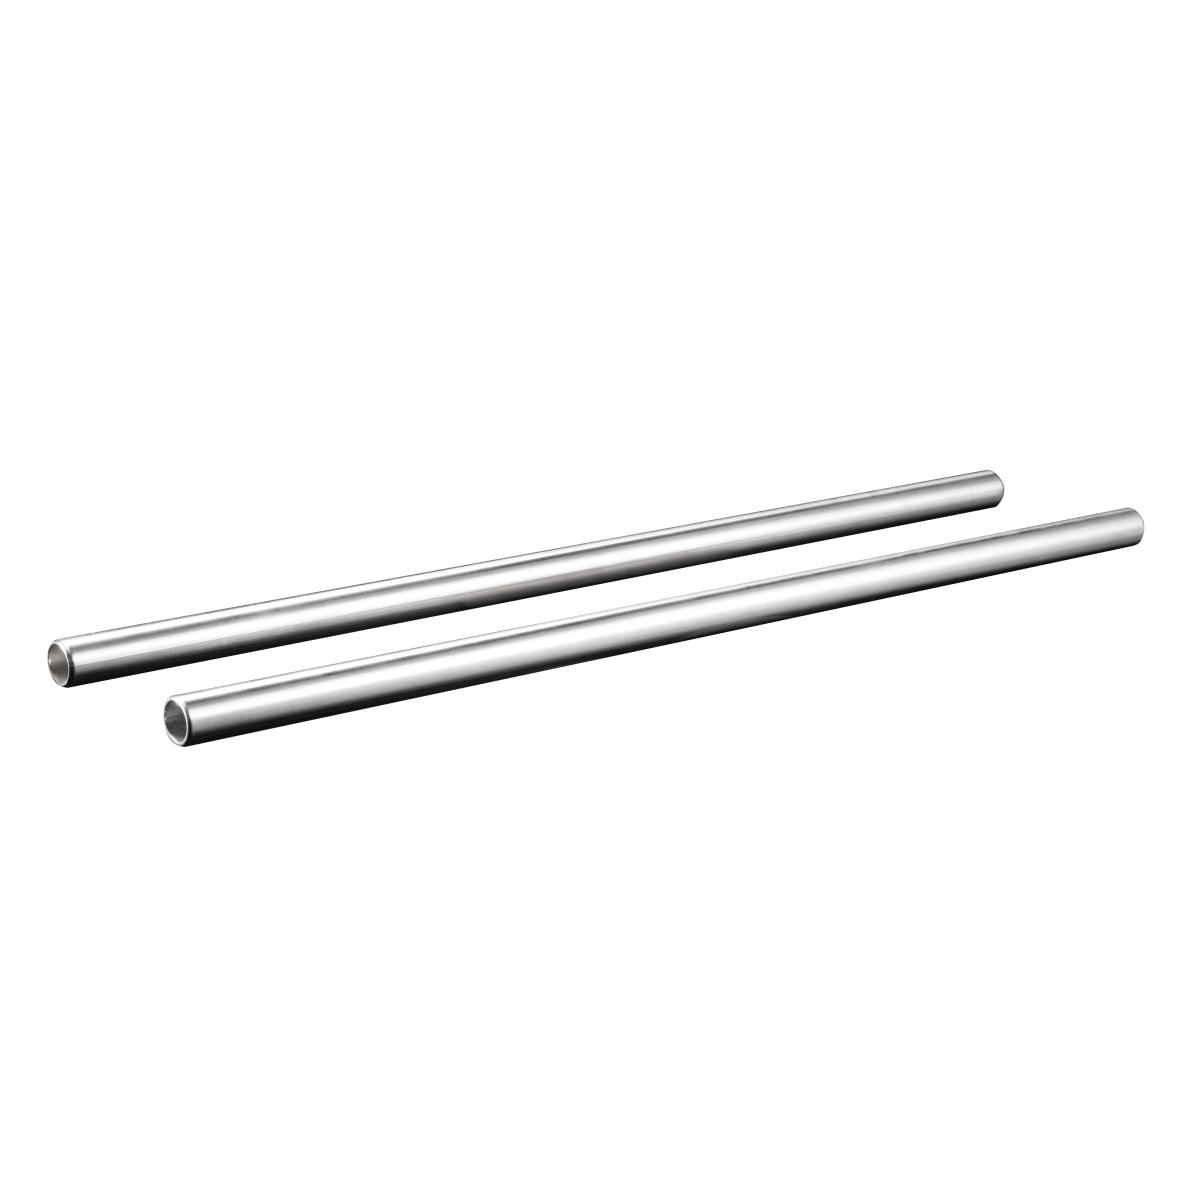 Walimex Pro Edelstahl Rods 400mm